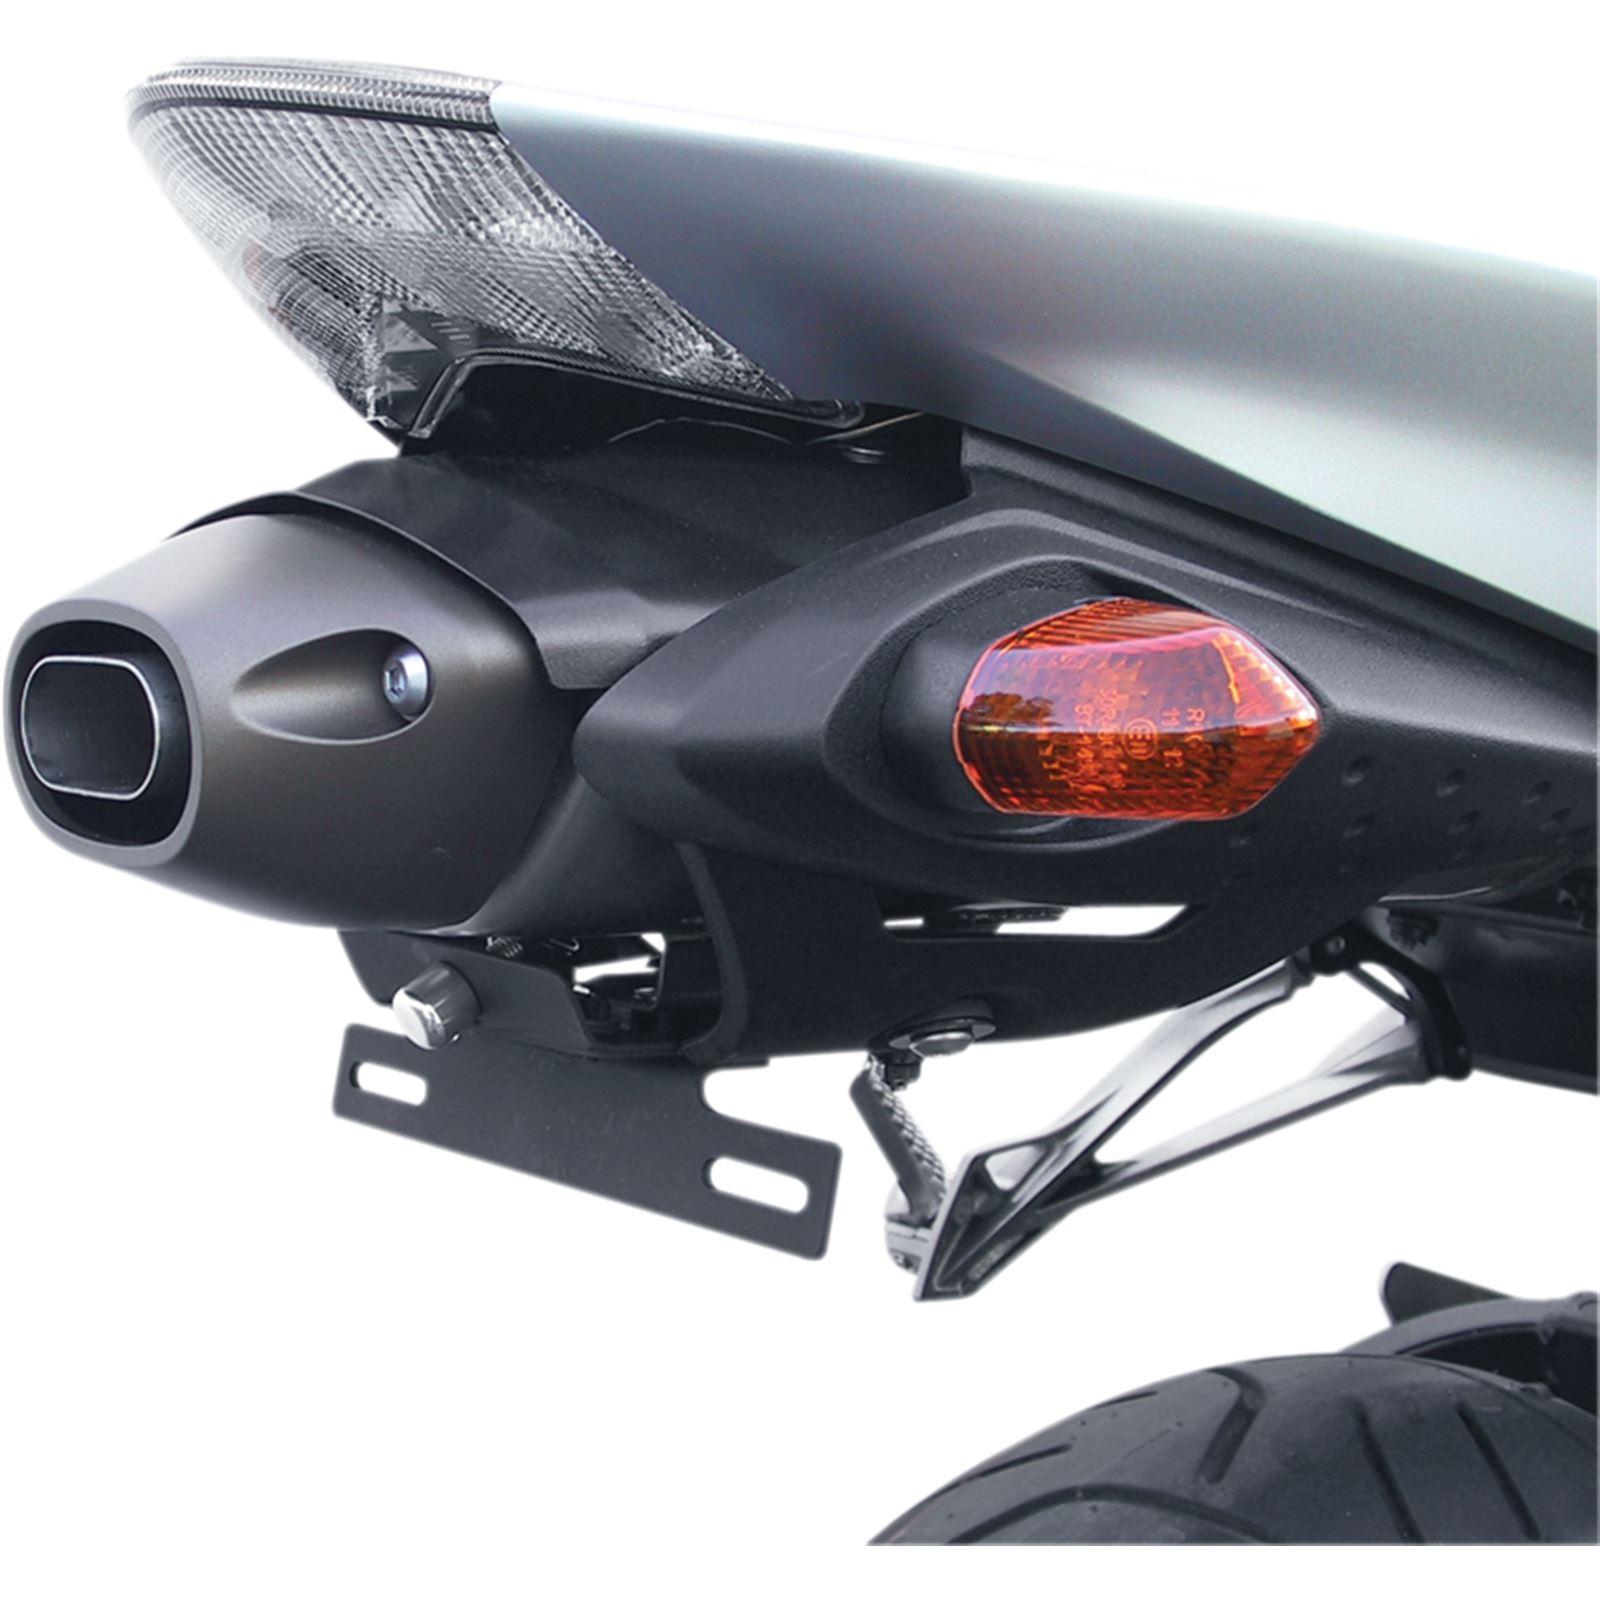 Targa Tail Kit with Signals - ZX6R/RR '05-'06